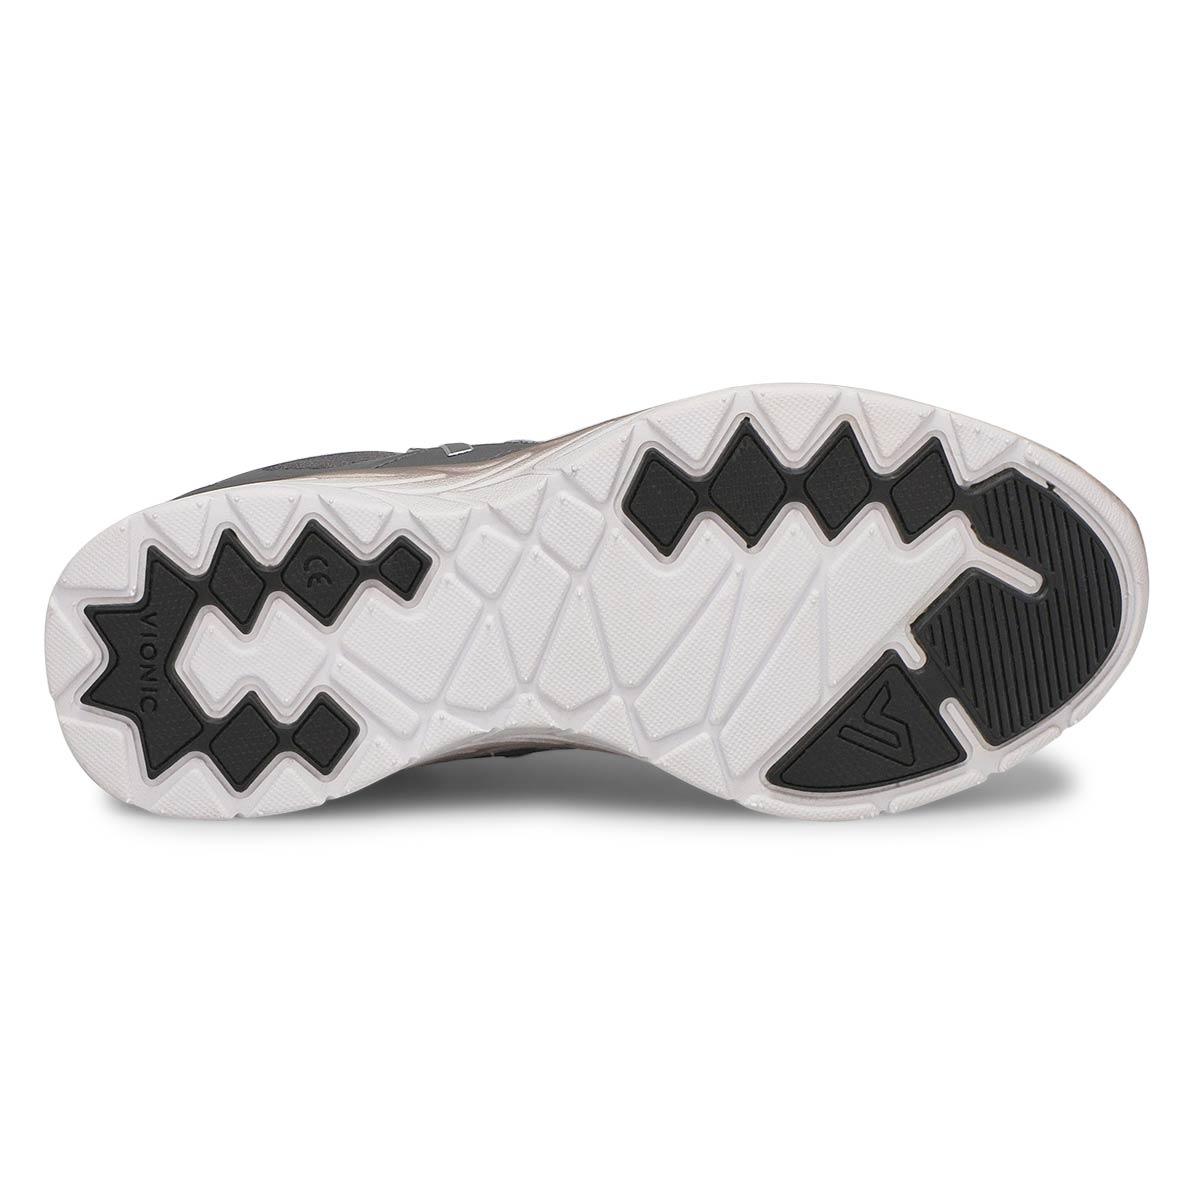 Women's 335Miles Running Shoe - Grey